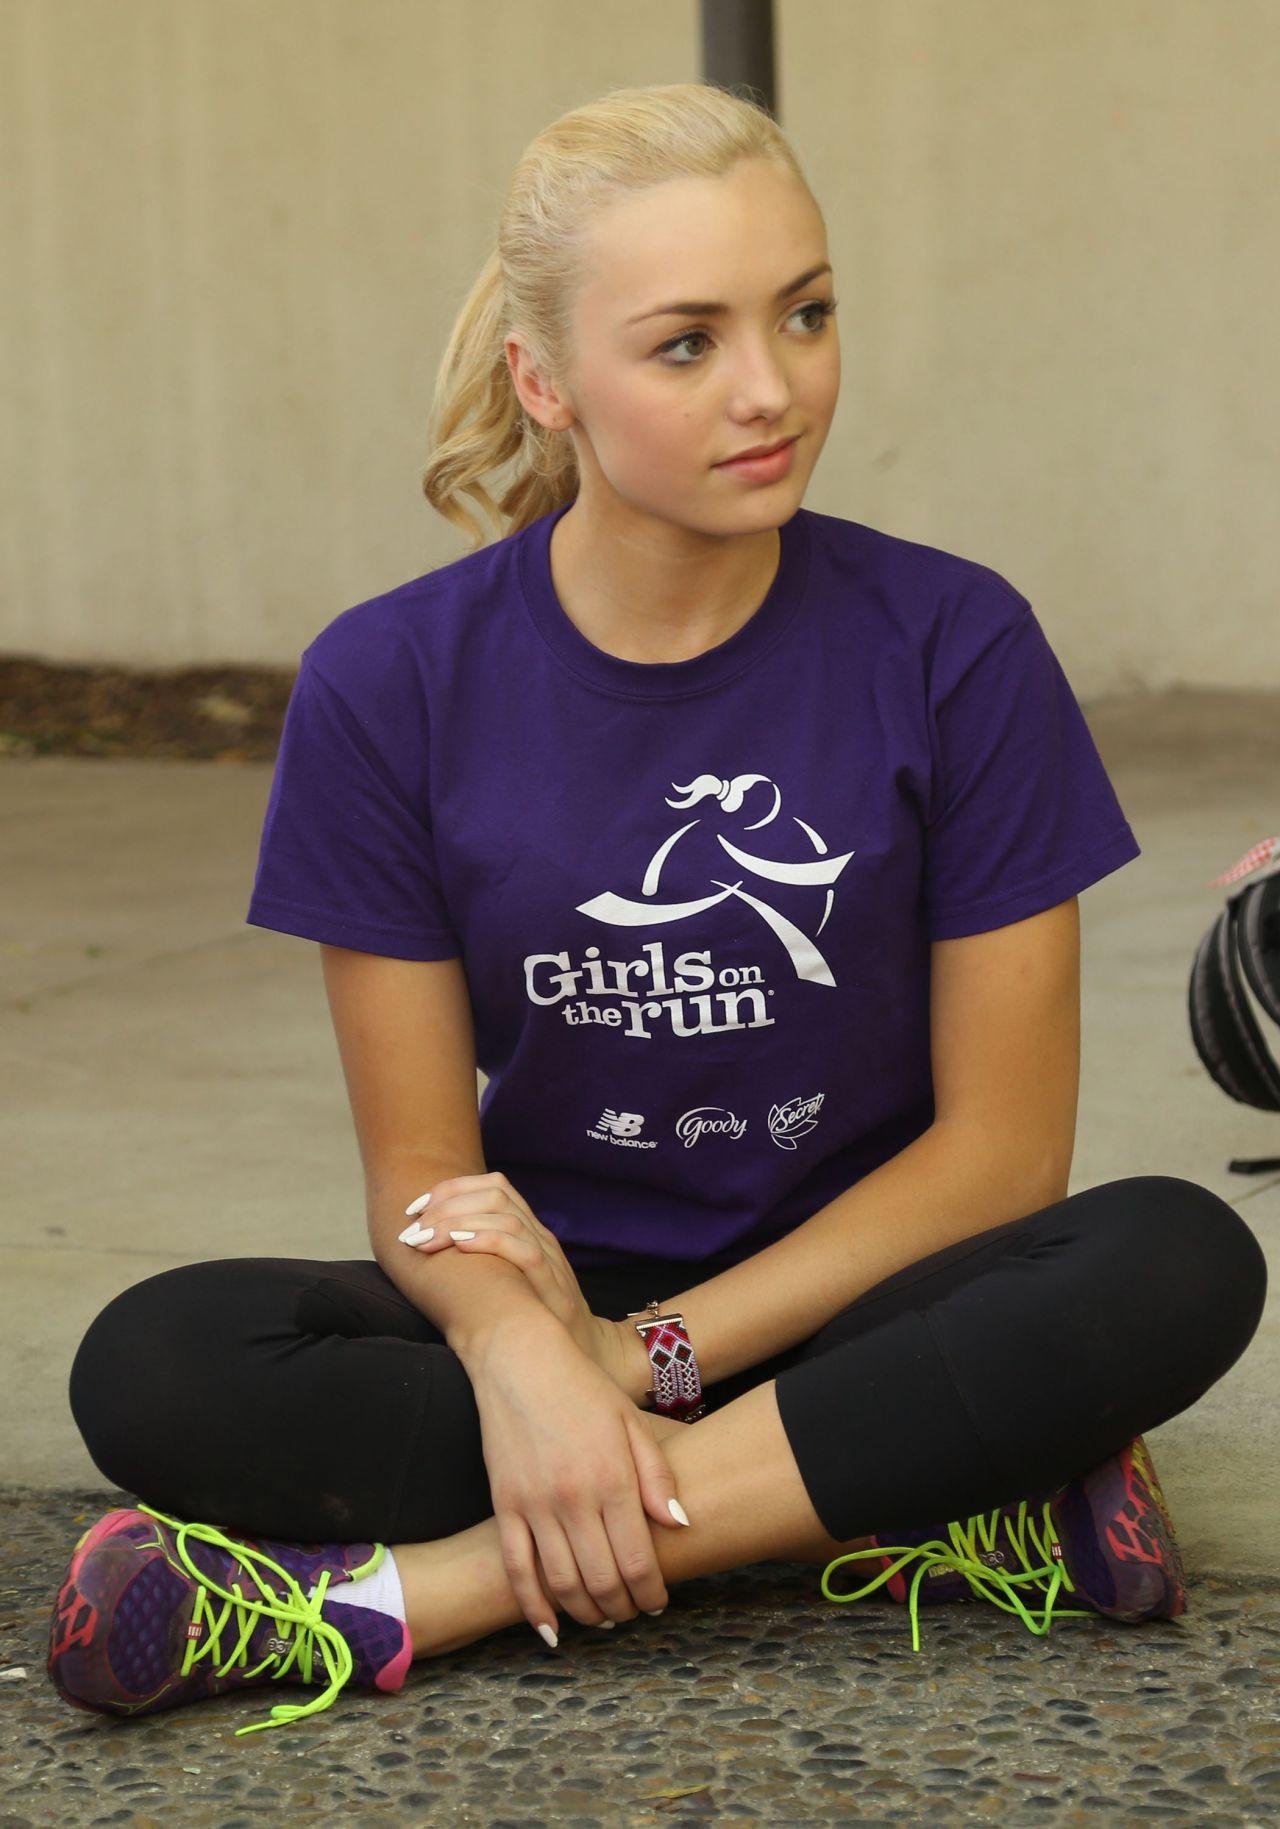 peyton list  u2013 girls on the run event in los angeles